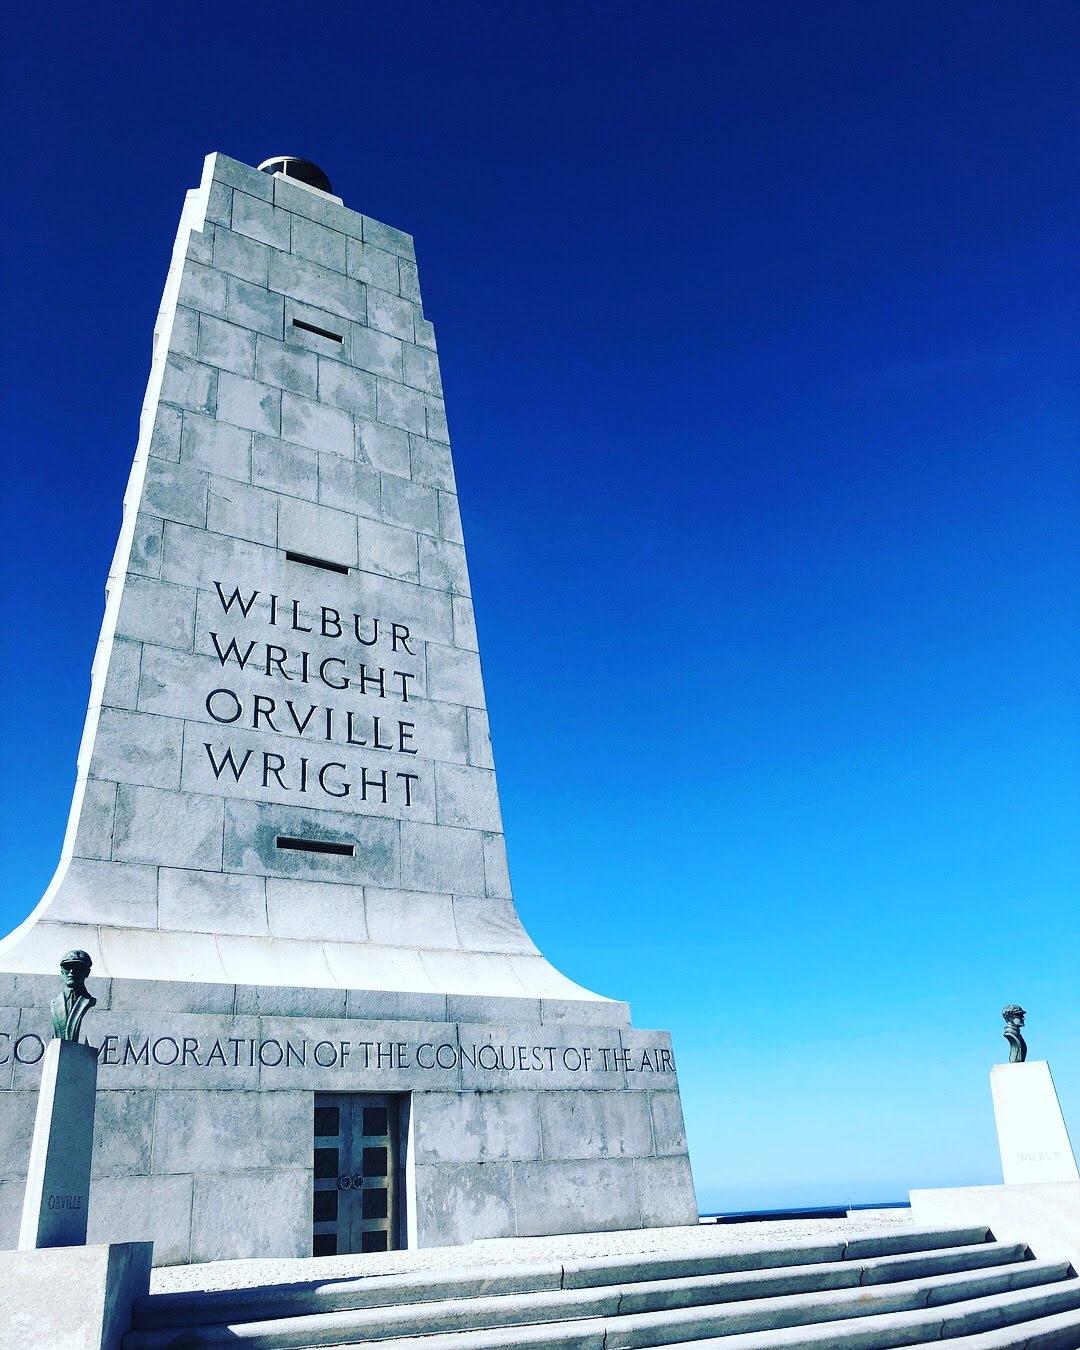 Memorialul National al fratilor Wright11